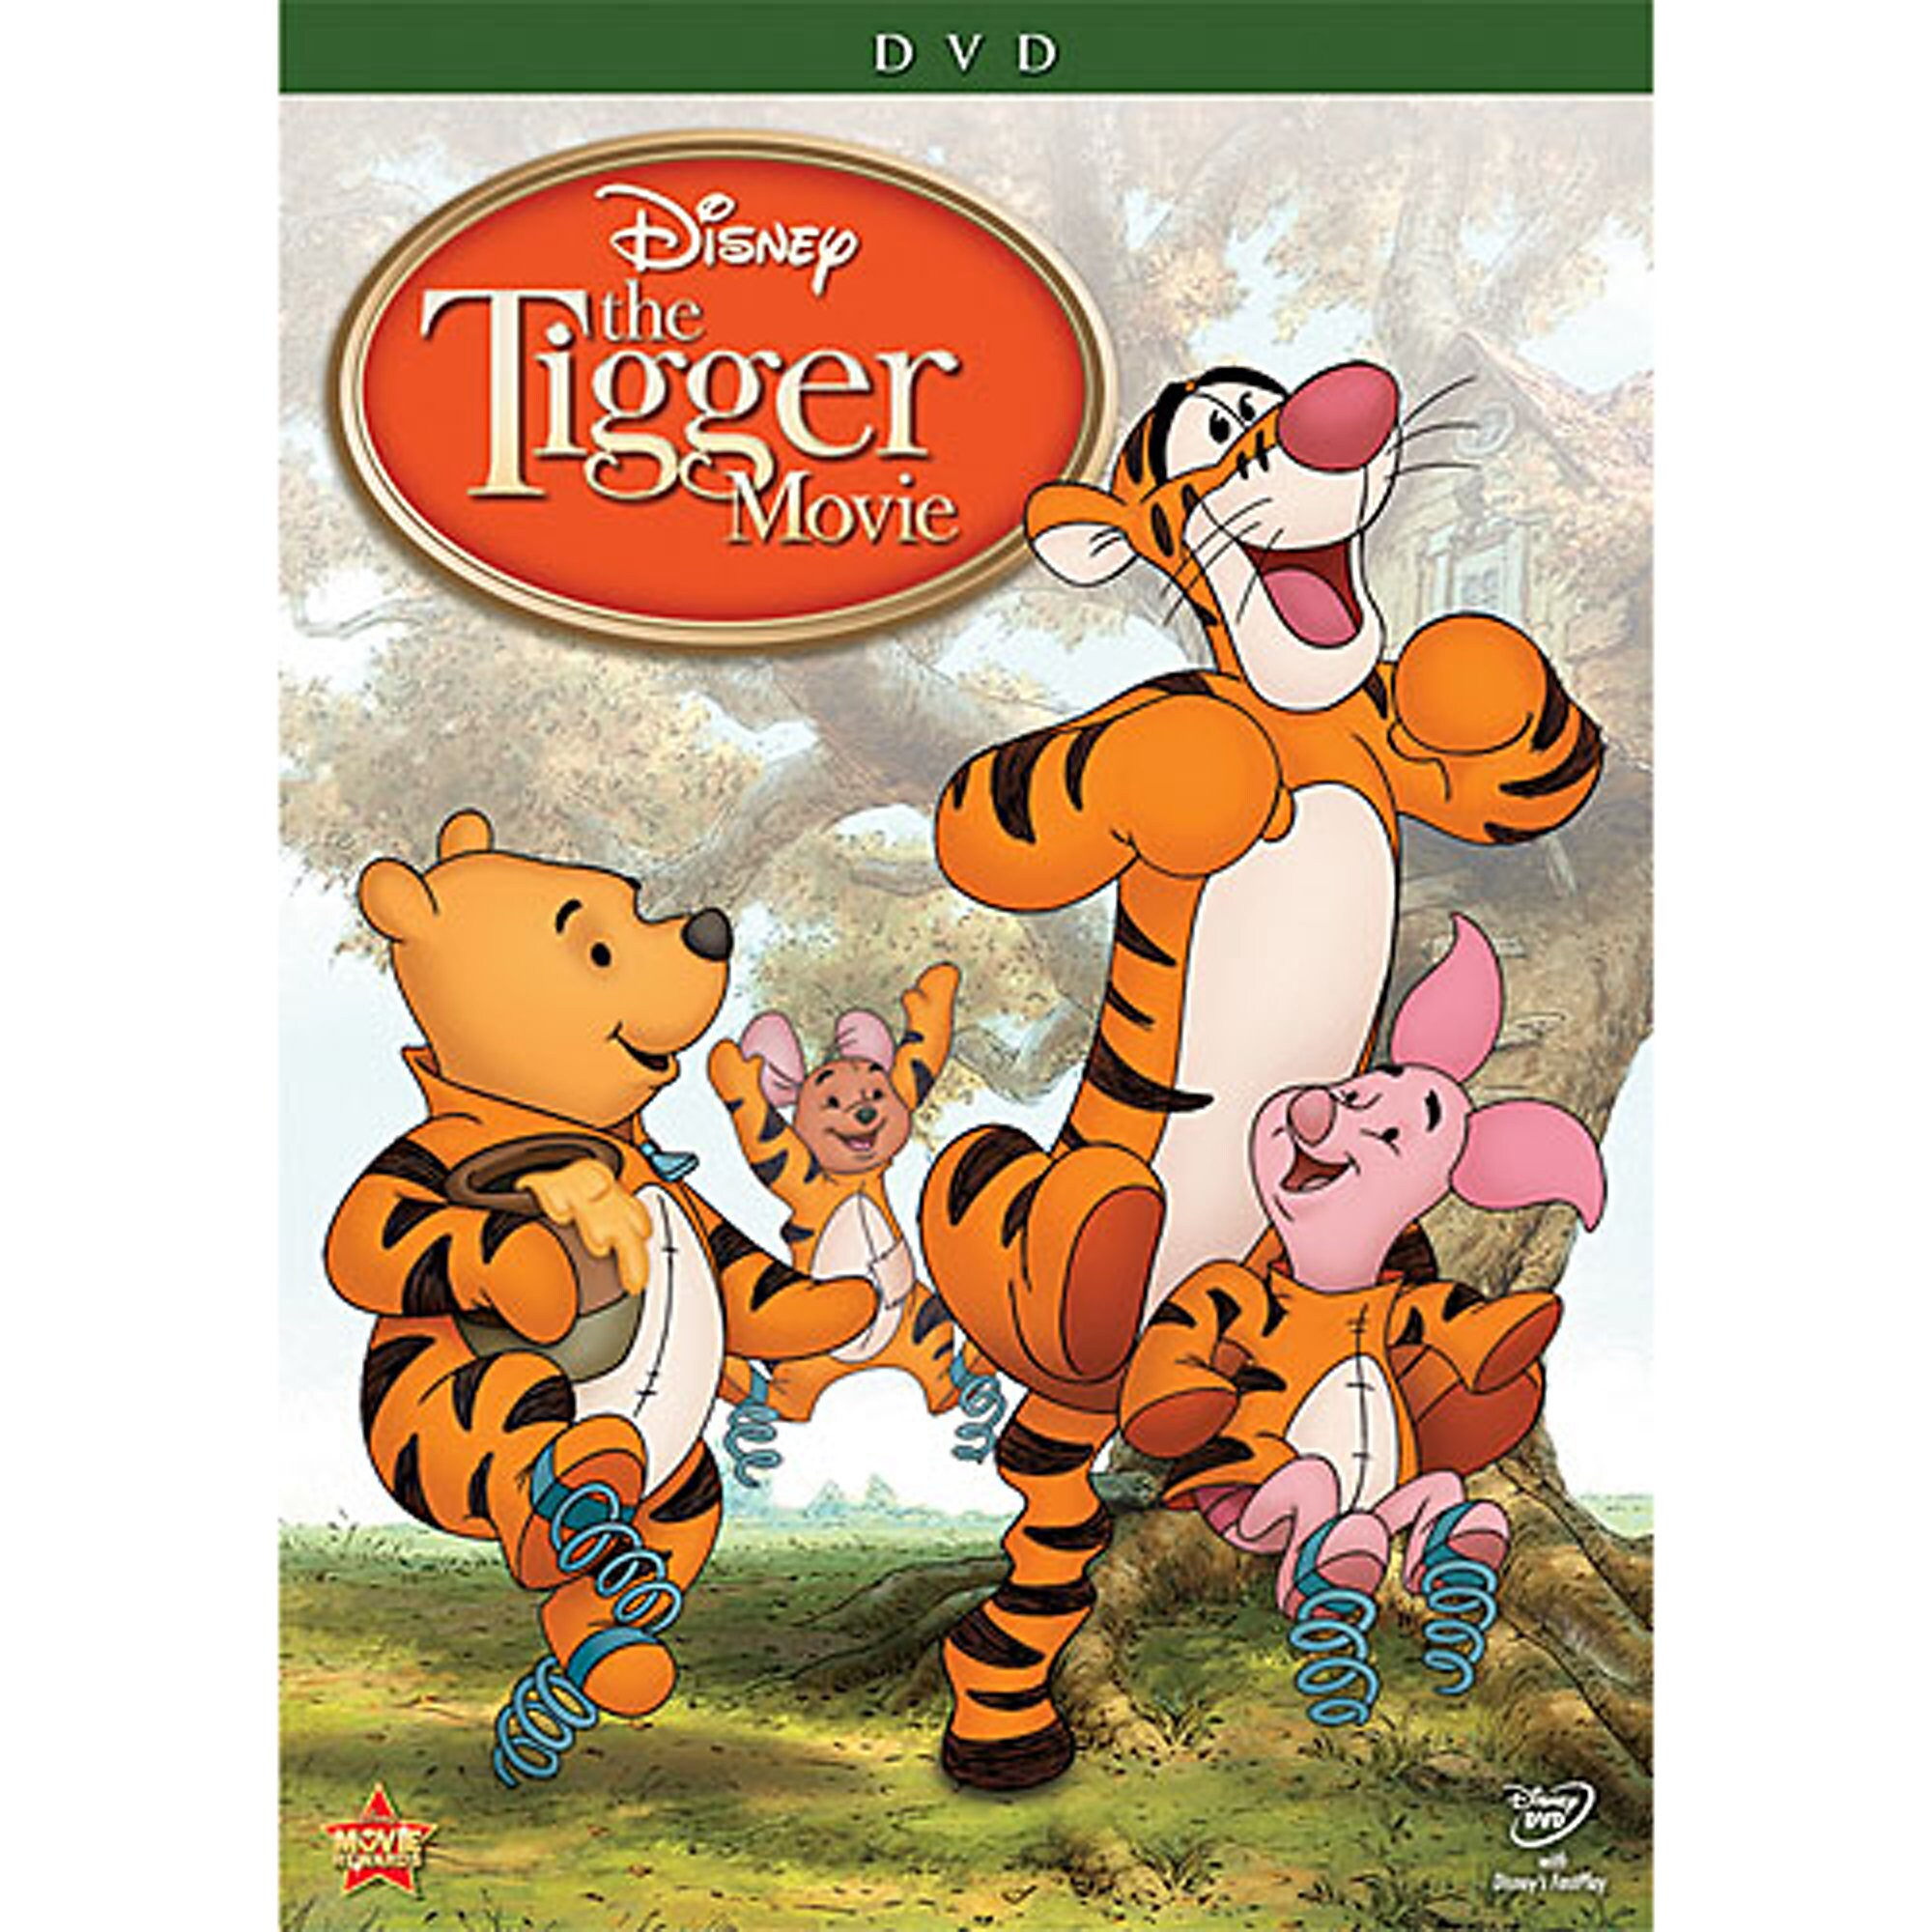 The Tigger Movie DVD